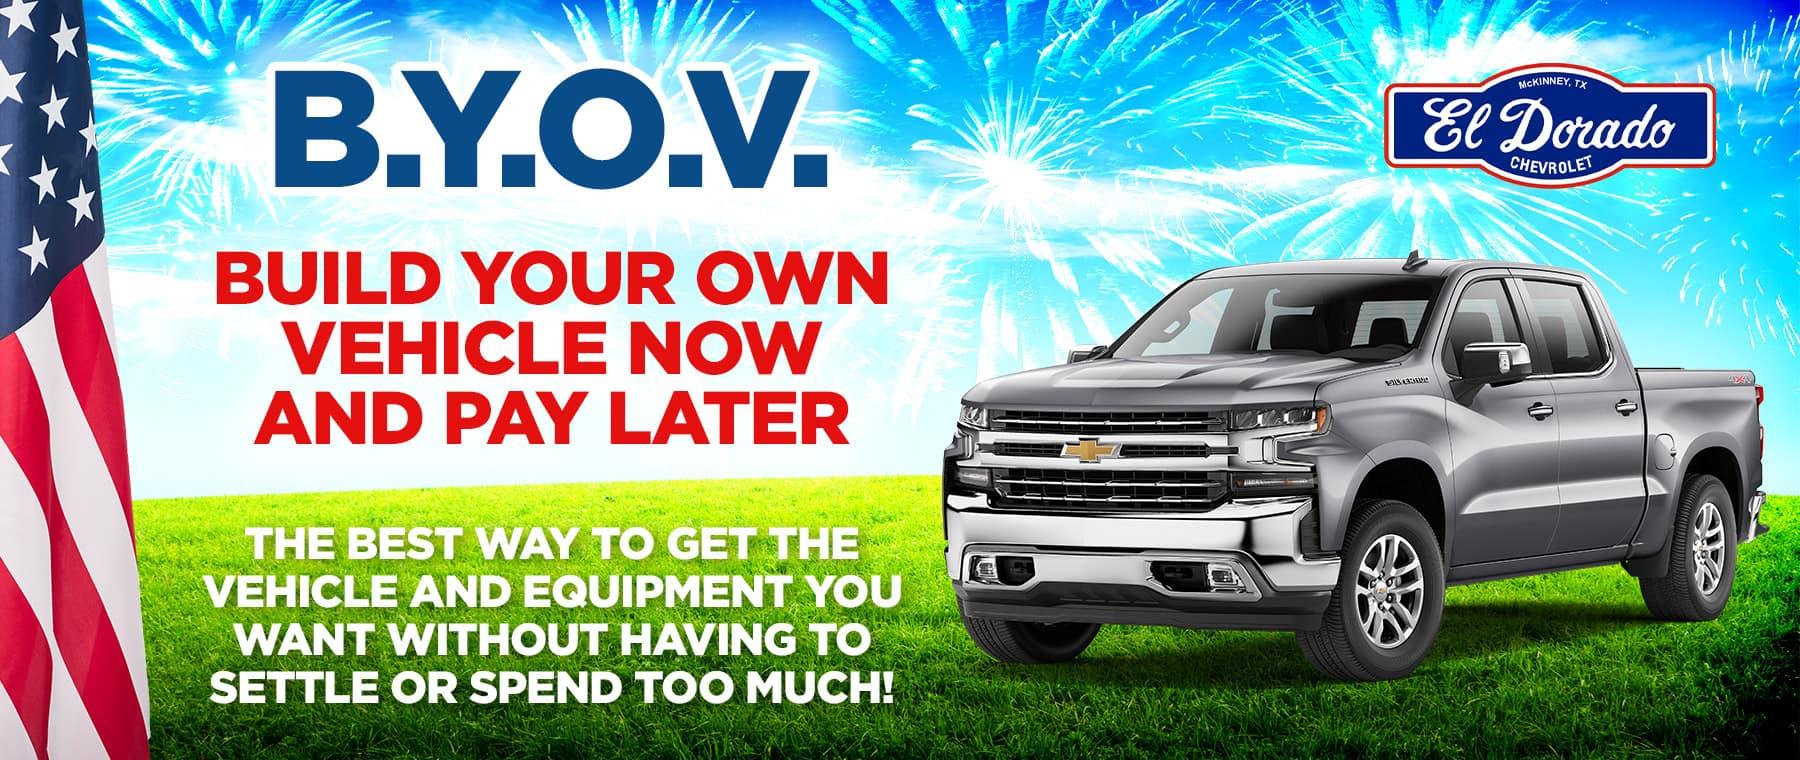 Build Your Own Vehicle - El Dorado Chevrolet in McKinney, Texas